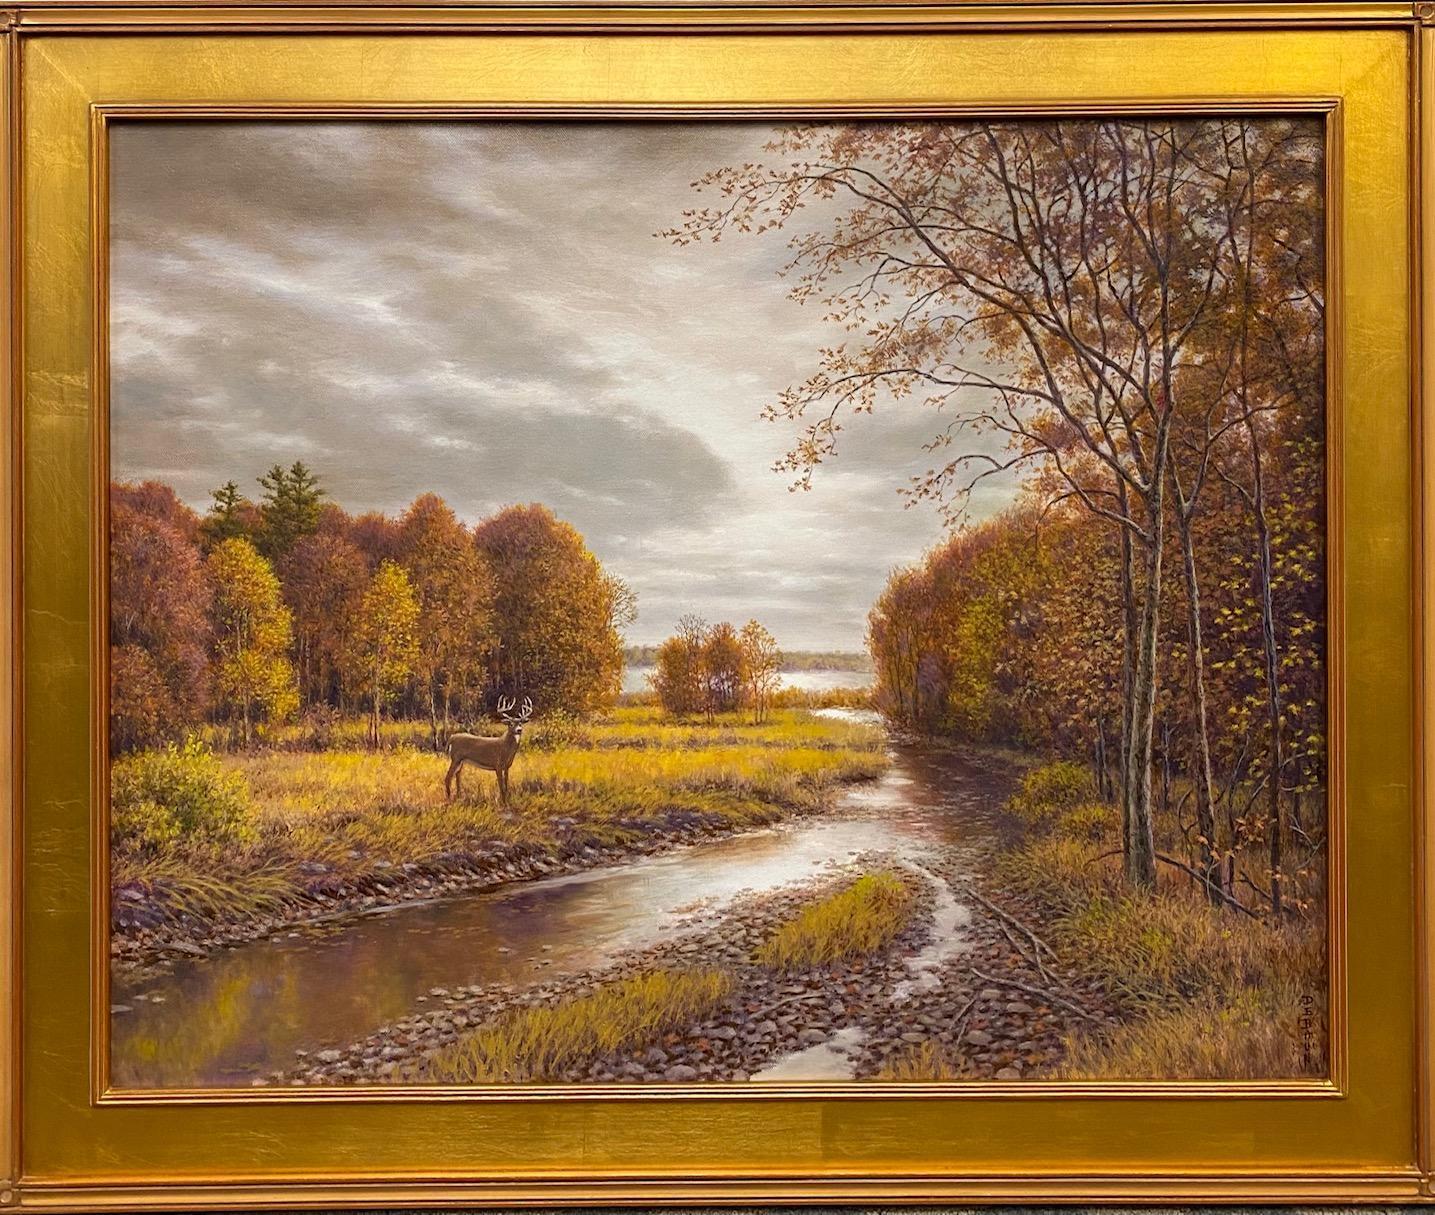 Silver, Gold and Rust, original 24x30 realistic Hudson River autumn landscape